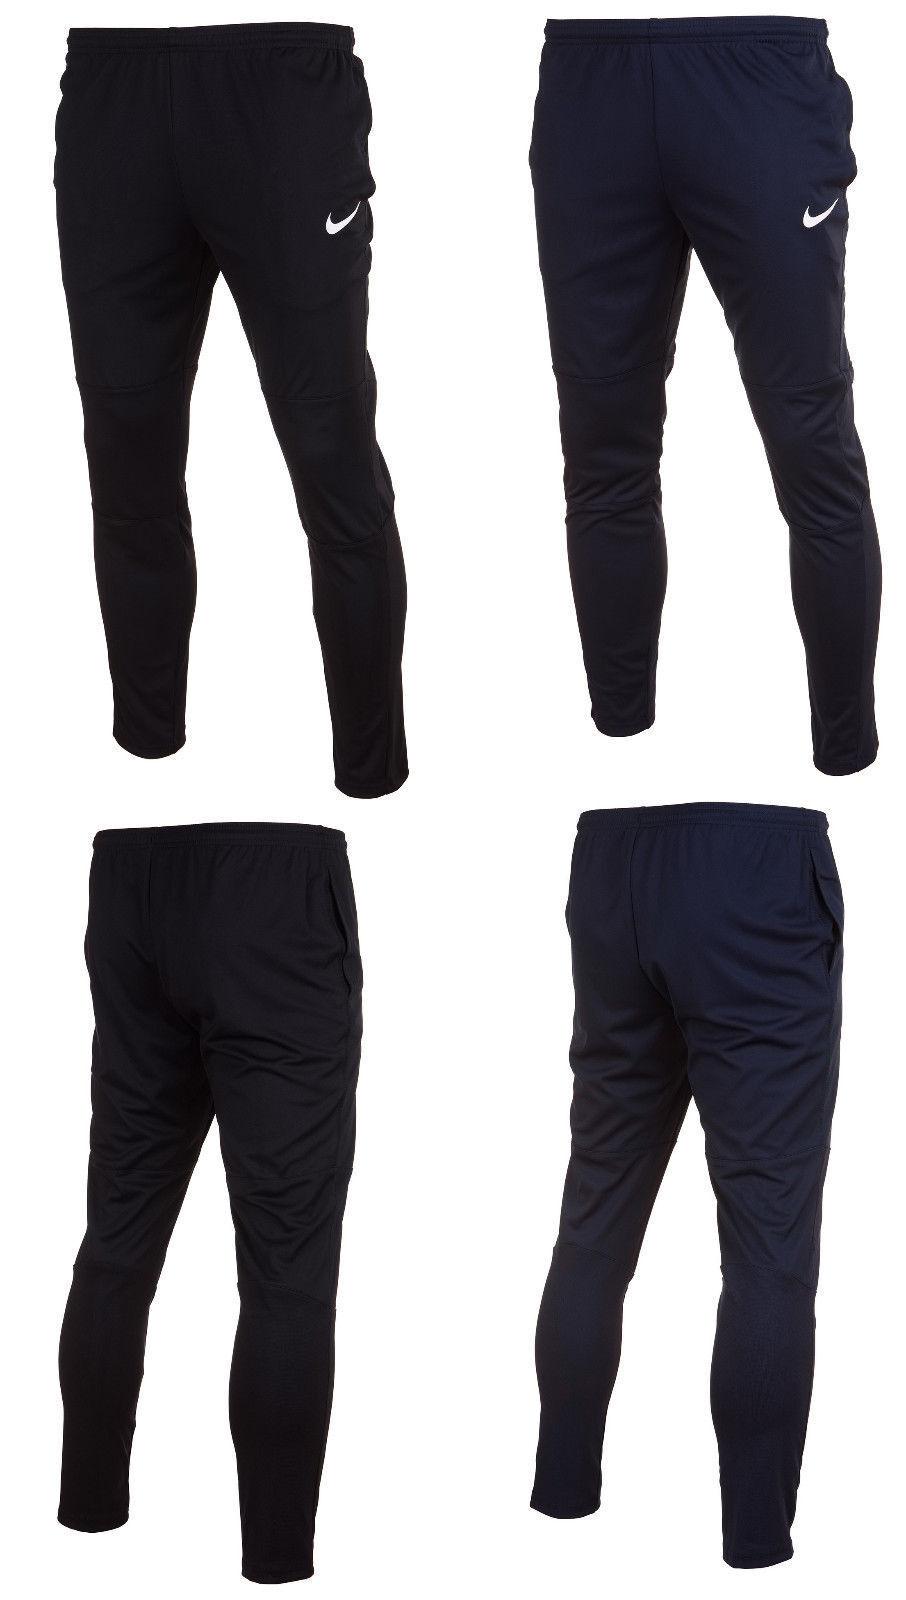 2a5818c28b49f5 Nike Park 18 Herren Hose Trainingshose Sporthose Jogginghose AA2086